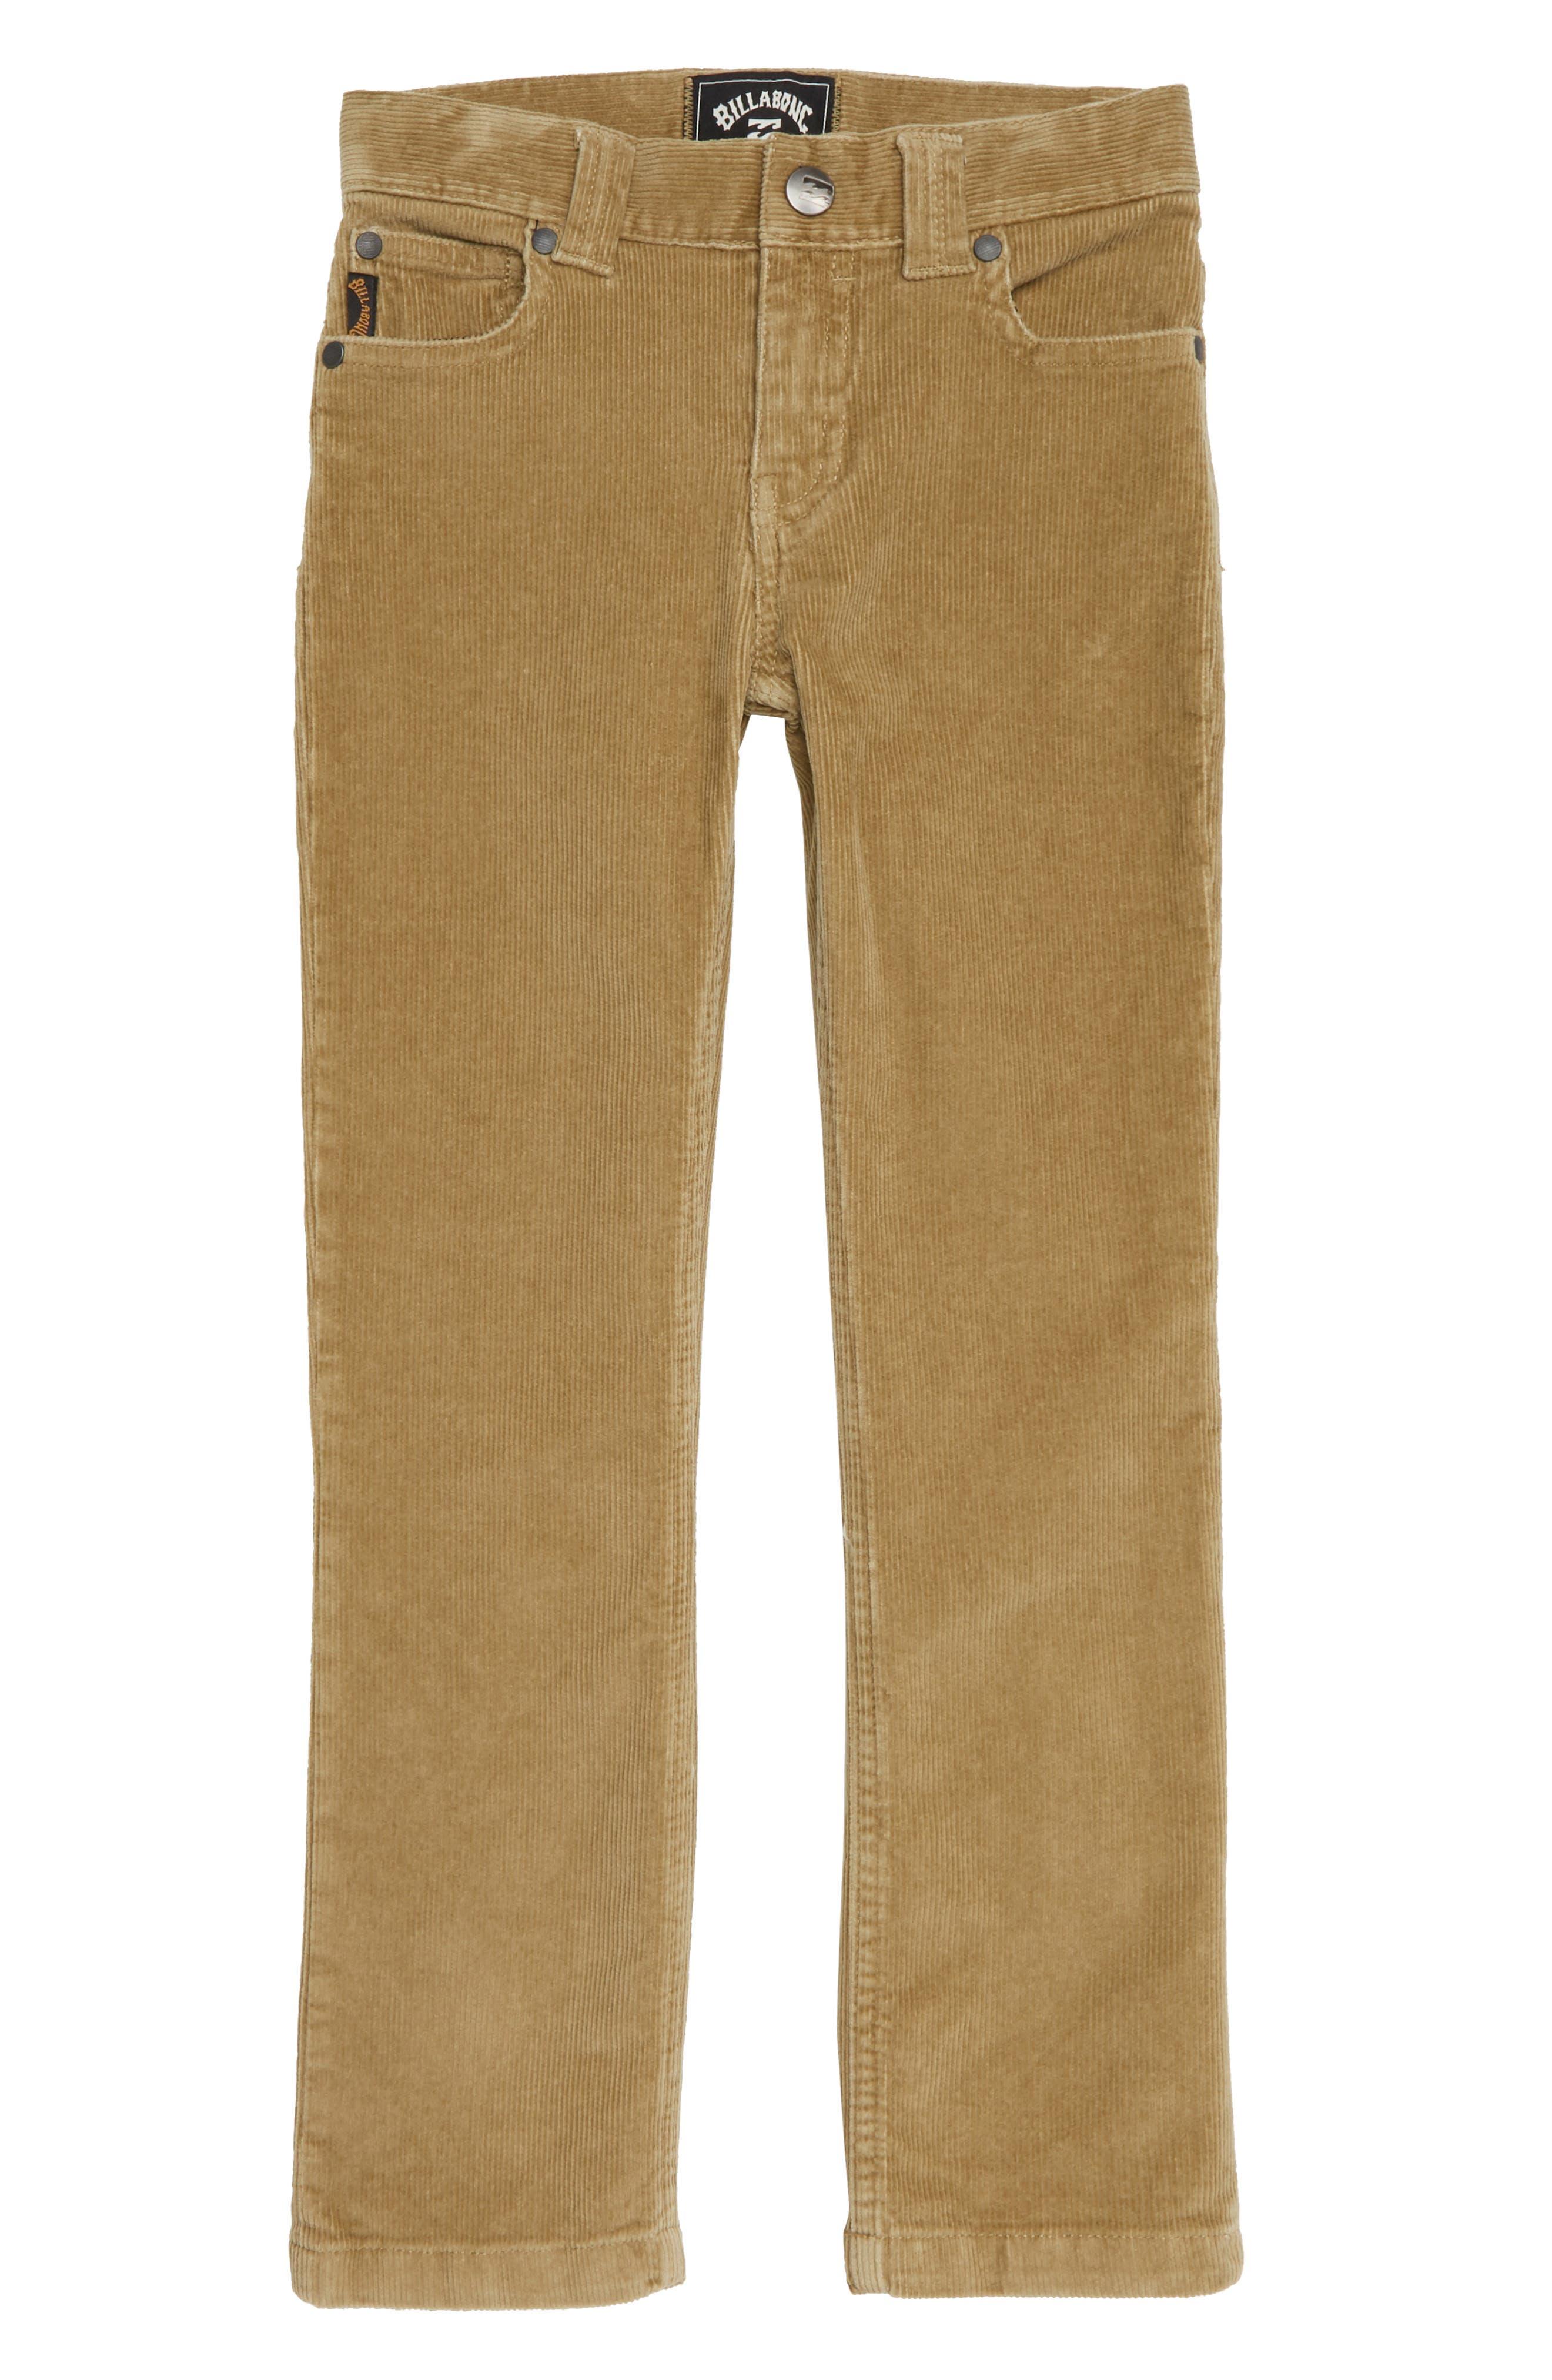 Outsider Corduroy Pants,                         Main,                         color, GRAVEL